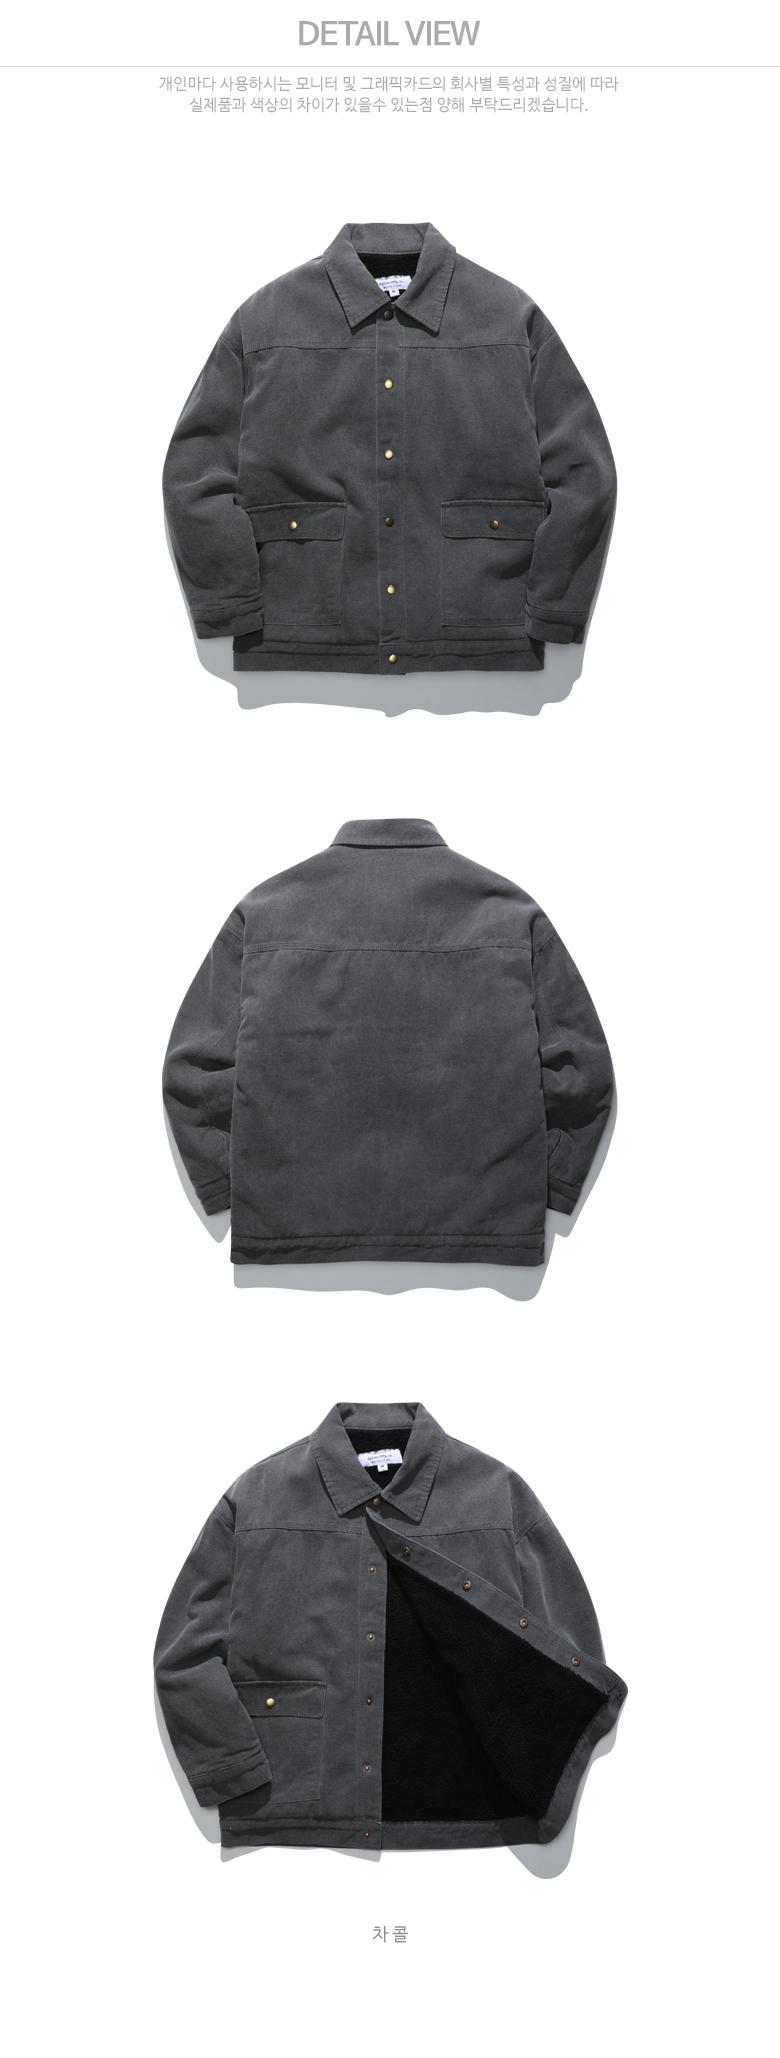 KHOT5094_detail_charcoal_01.jpg